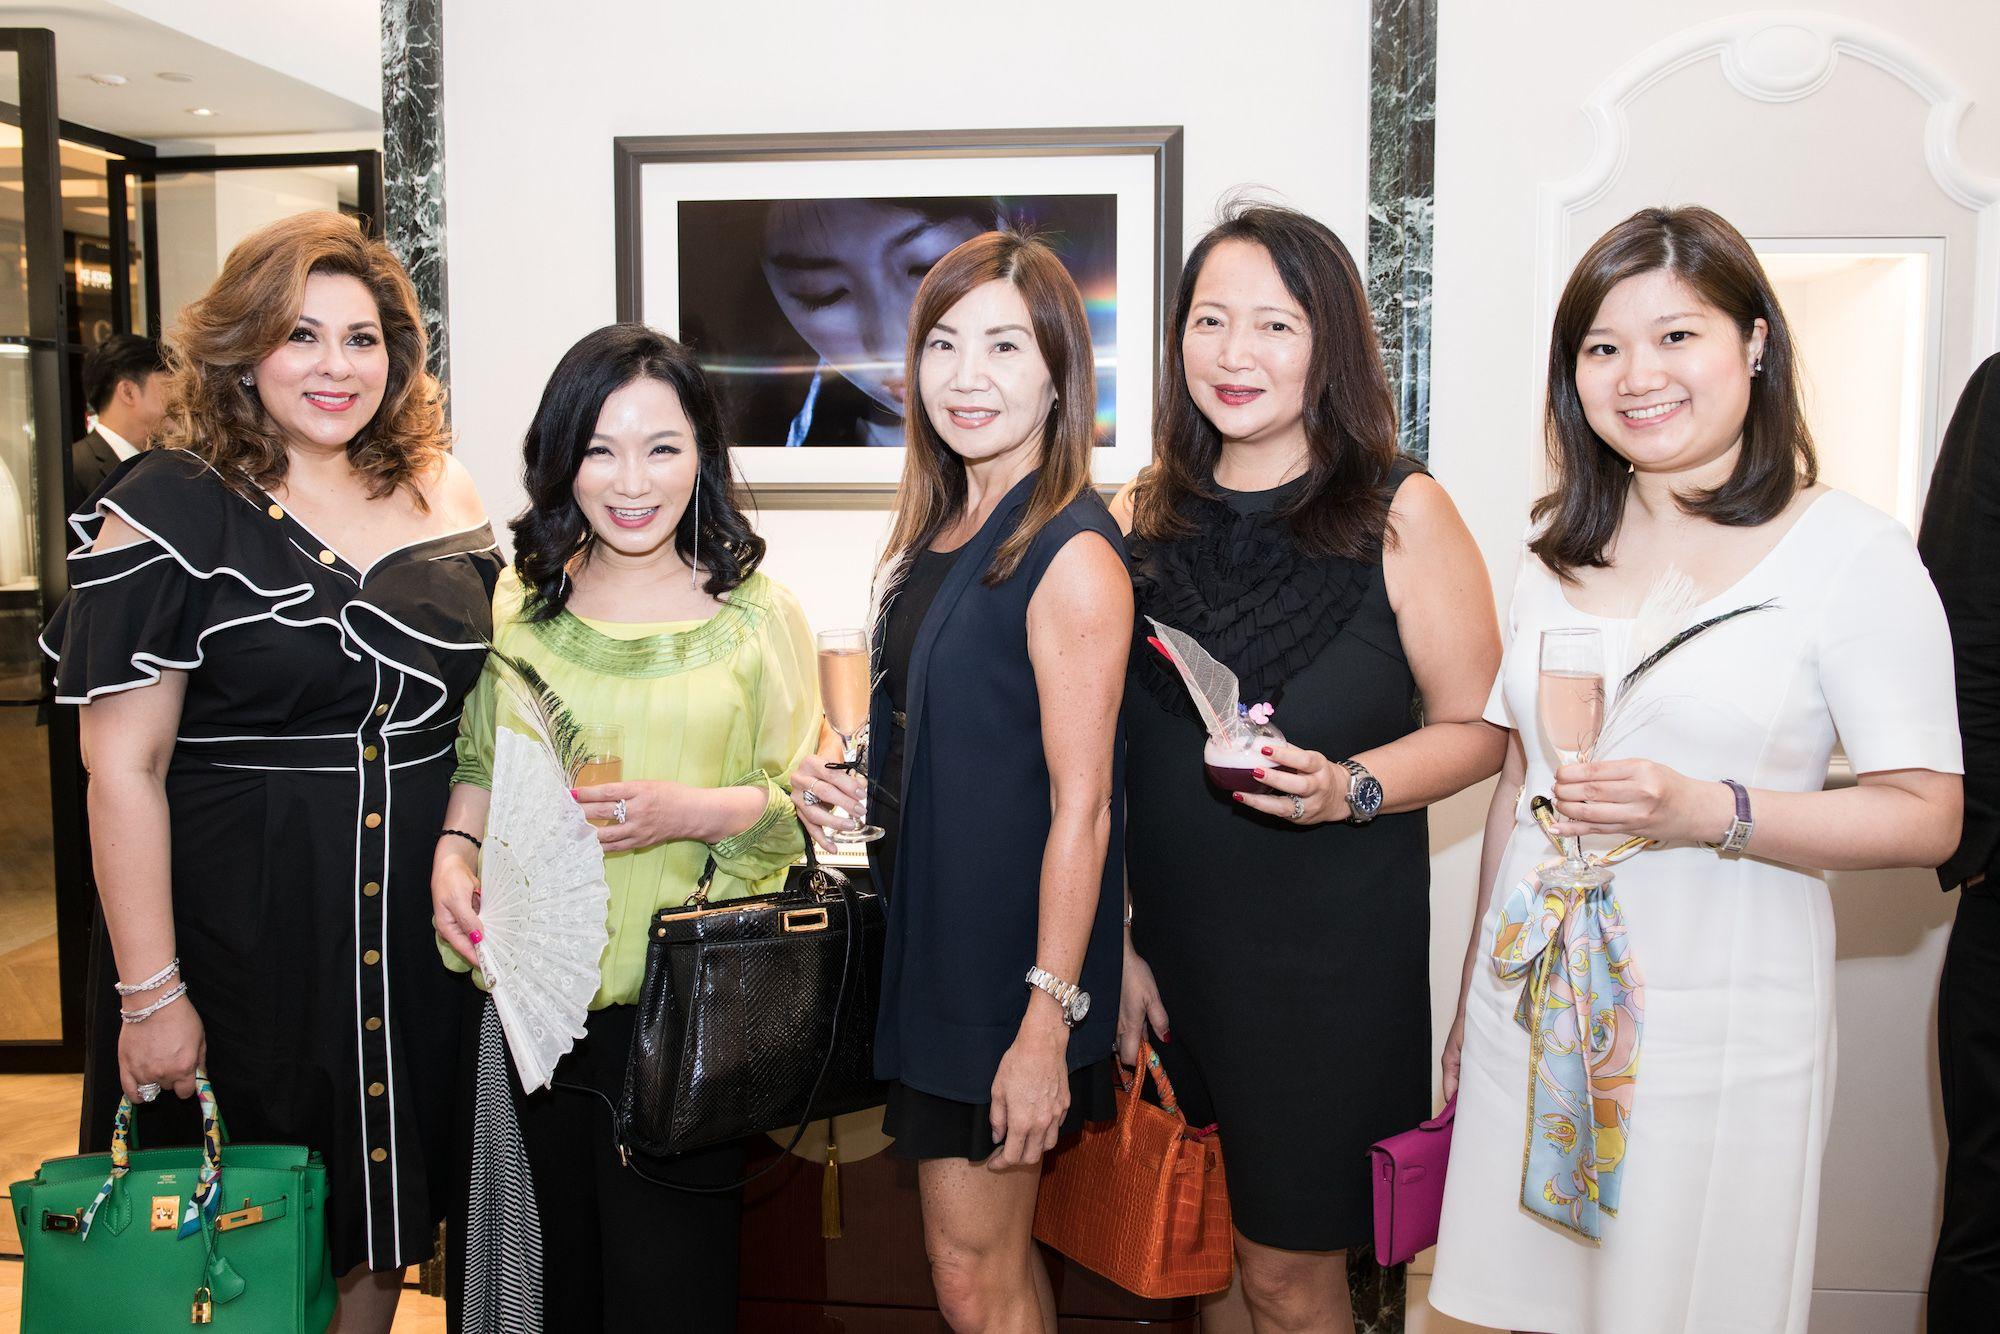 Rina Wadhwani, Rachel Park-Monballiu, Esther Ma, Vicky Wong, Carmen Choi